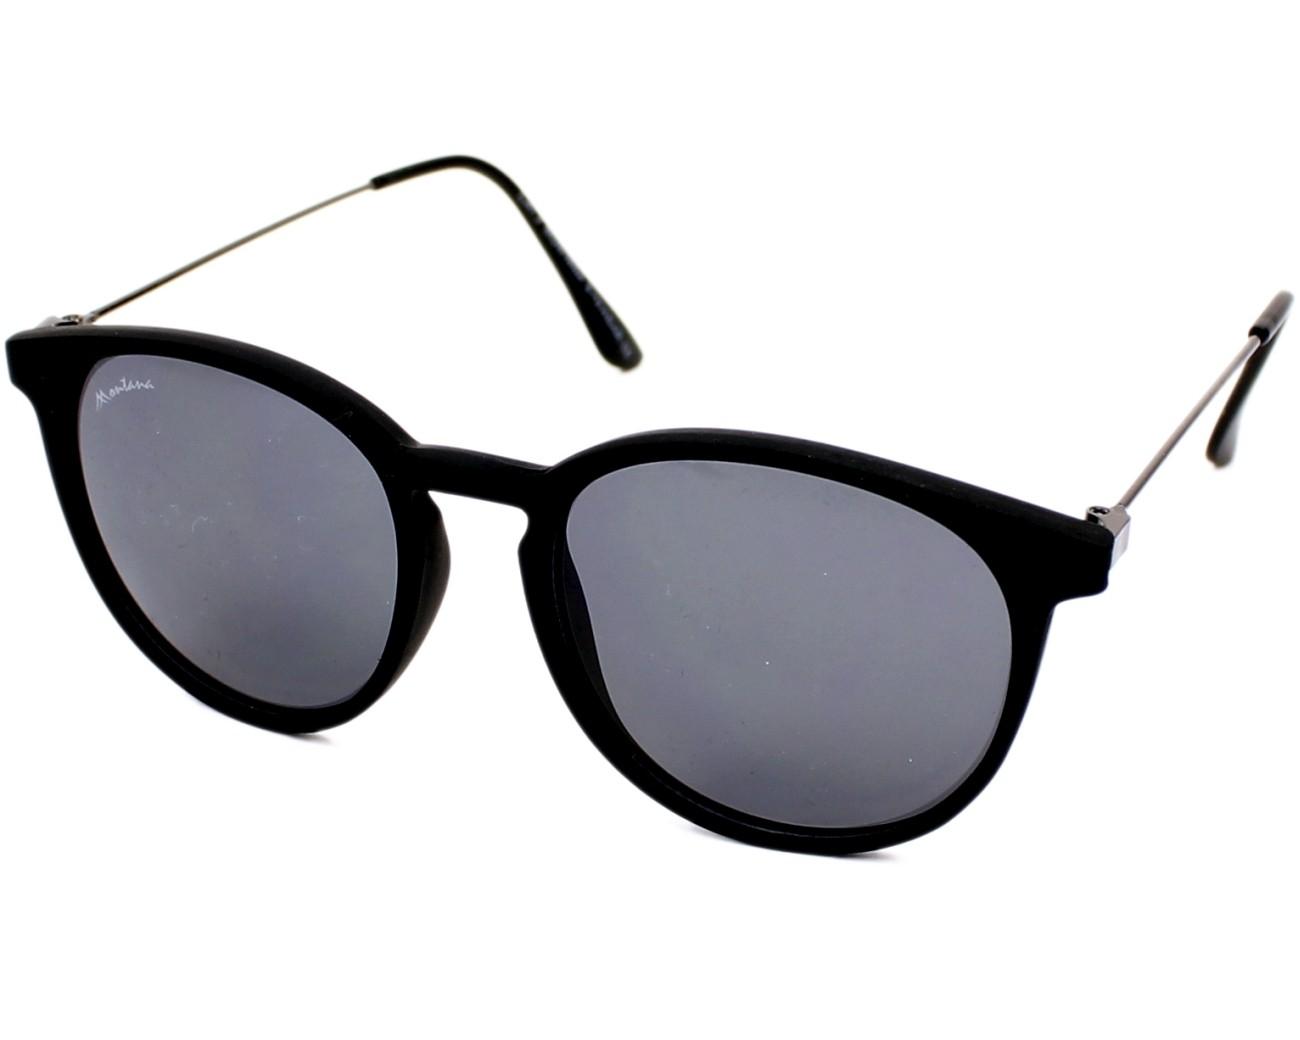 f27d6e676f4 Sunglasses Montana S-33 black 50-17 Black Gun profile view